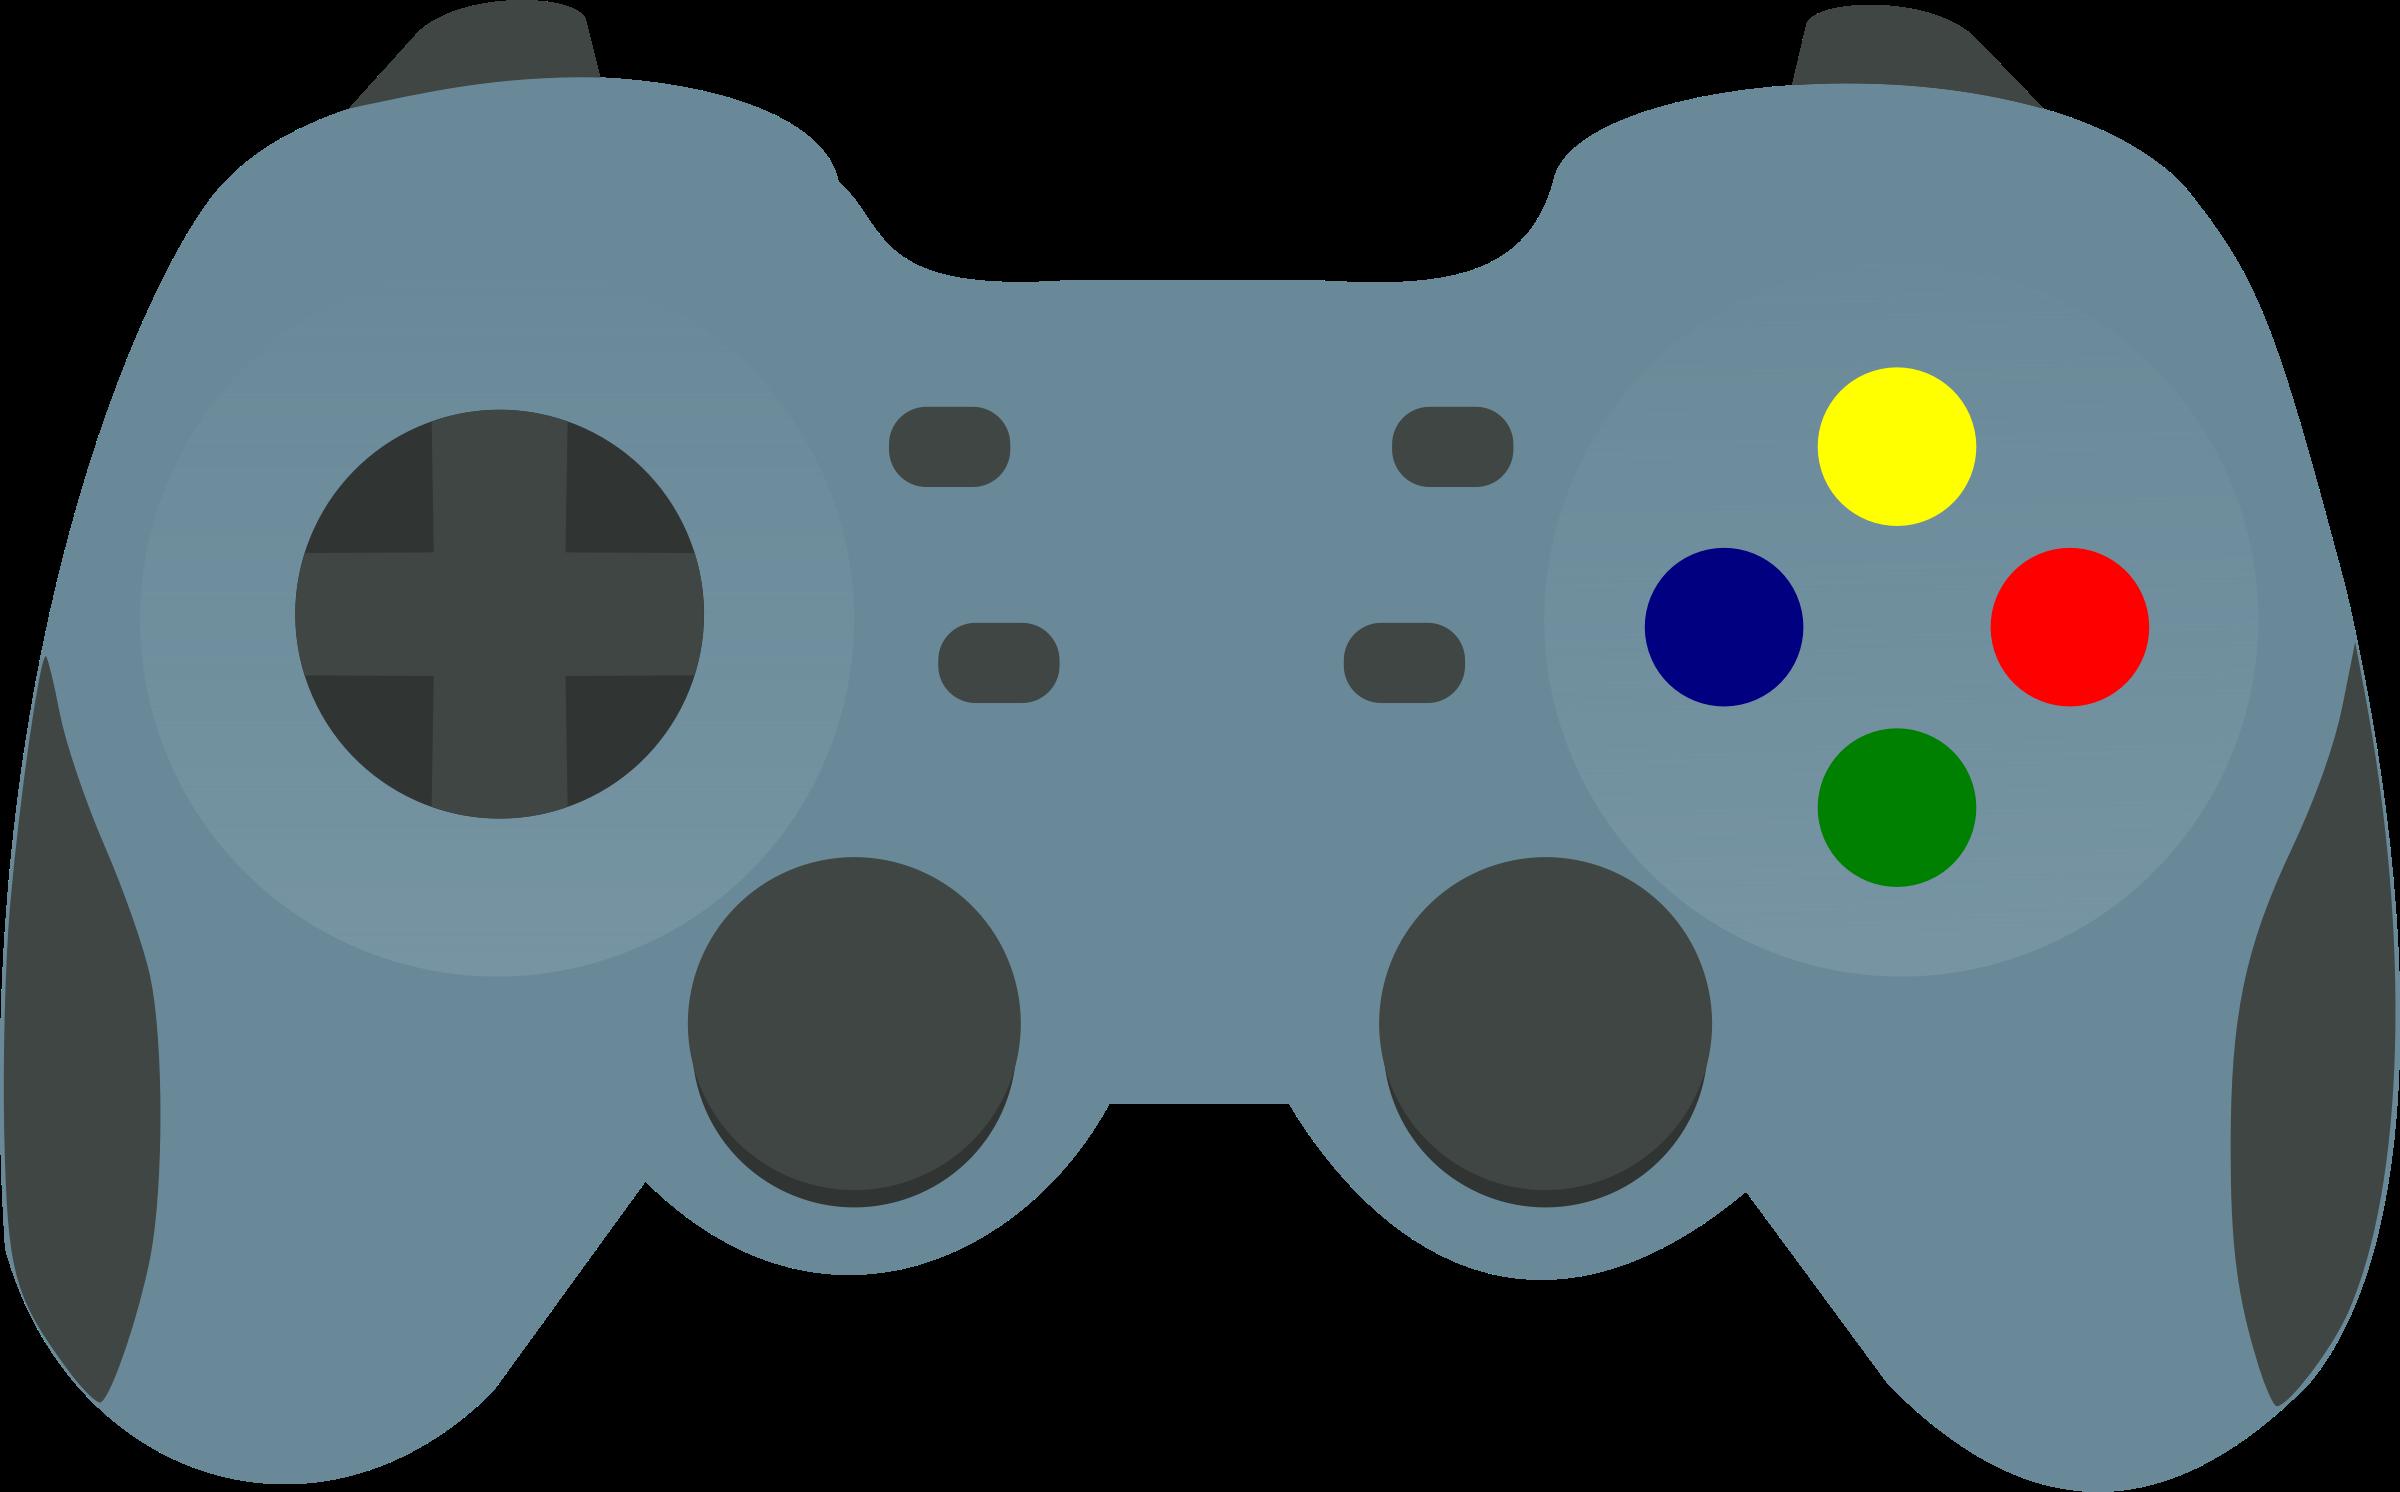 Gamepad big image png. Electronics clipart controller